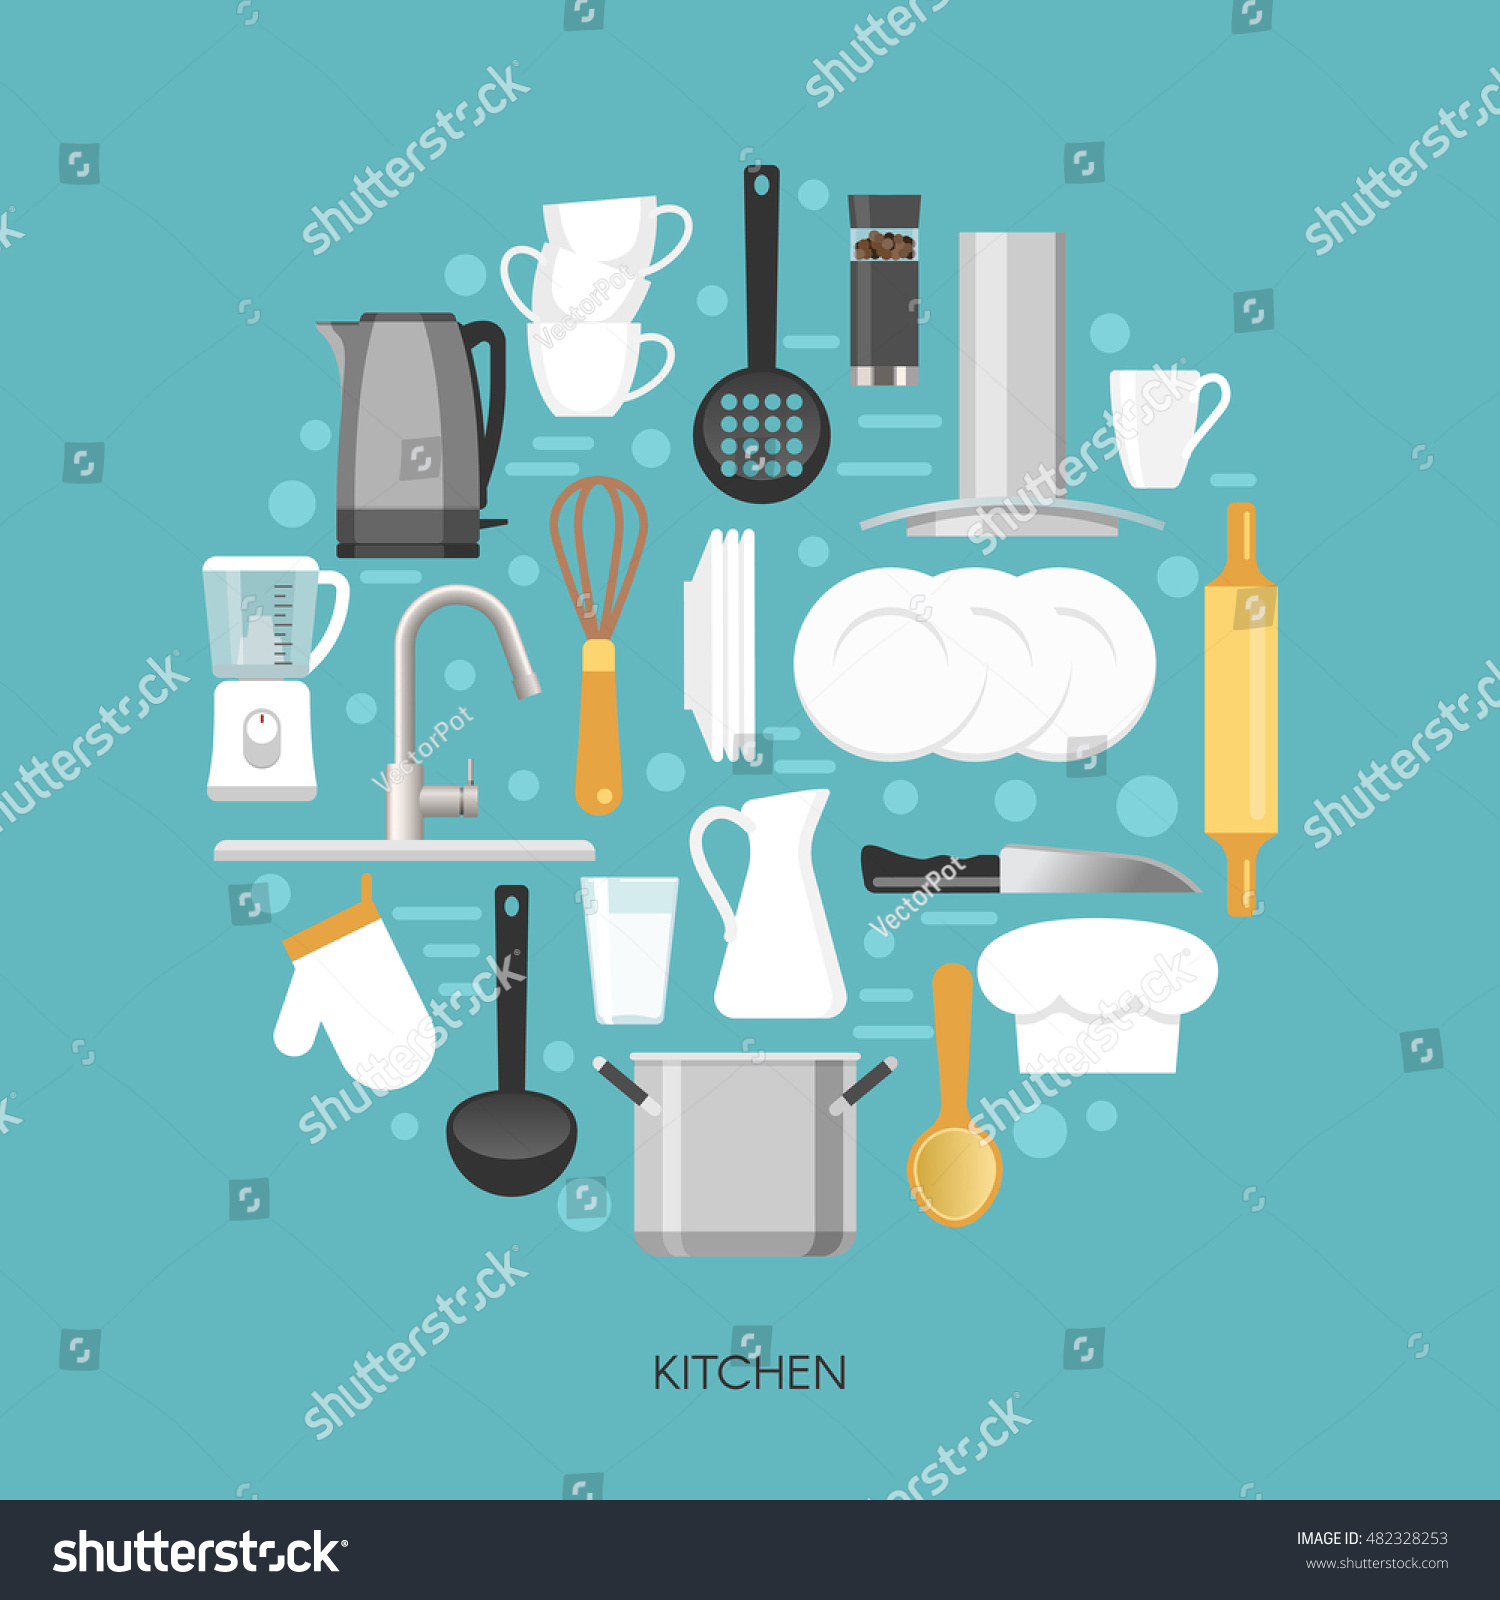 Kitchen Round Composition Household Appliances Faucet Stock Vector ...